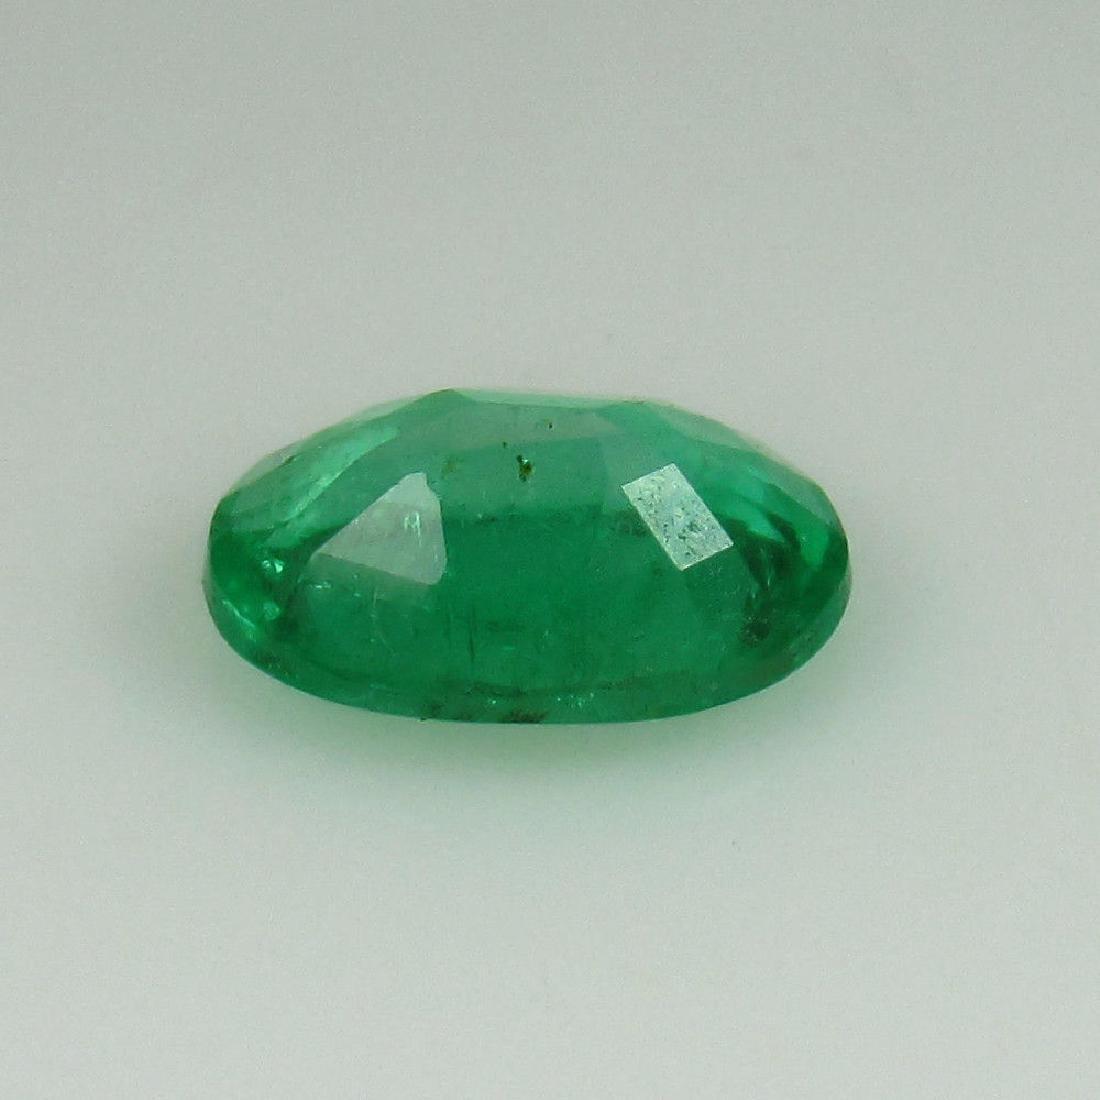 0.95 Ct Genuine Zambian Emerald 8X6 mm Oval cut Top - 3